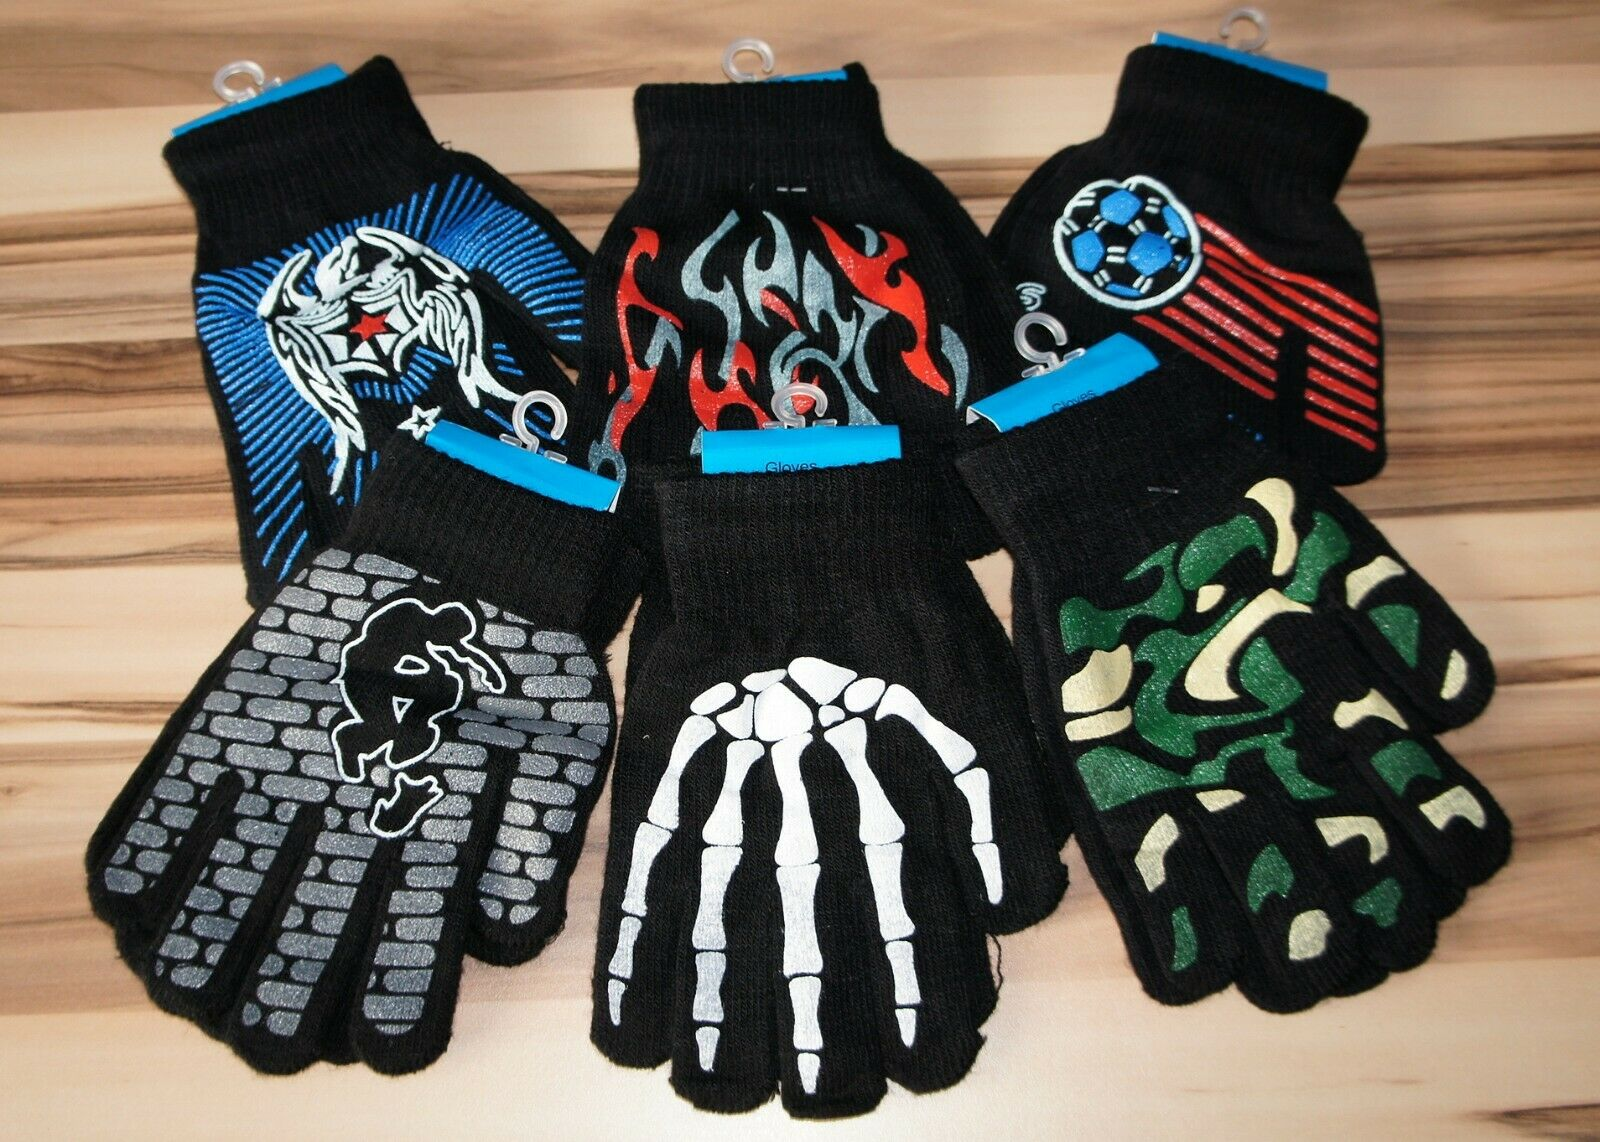 Jungen Handschuhe Schwarz 6 Motive Kinder Handschuhe Skelett Fußball Tribal